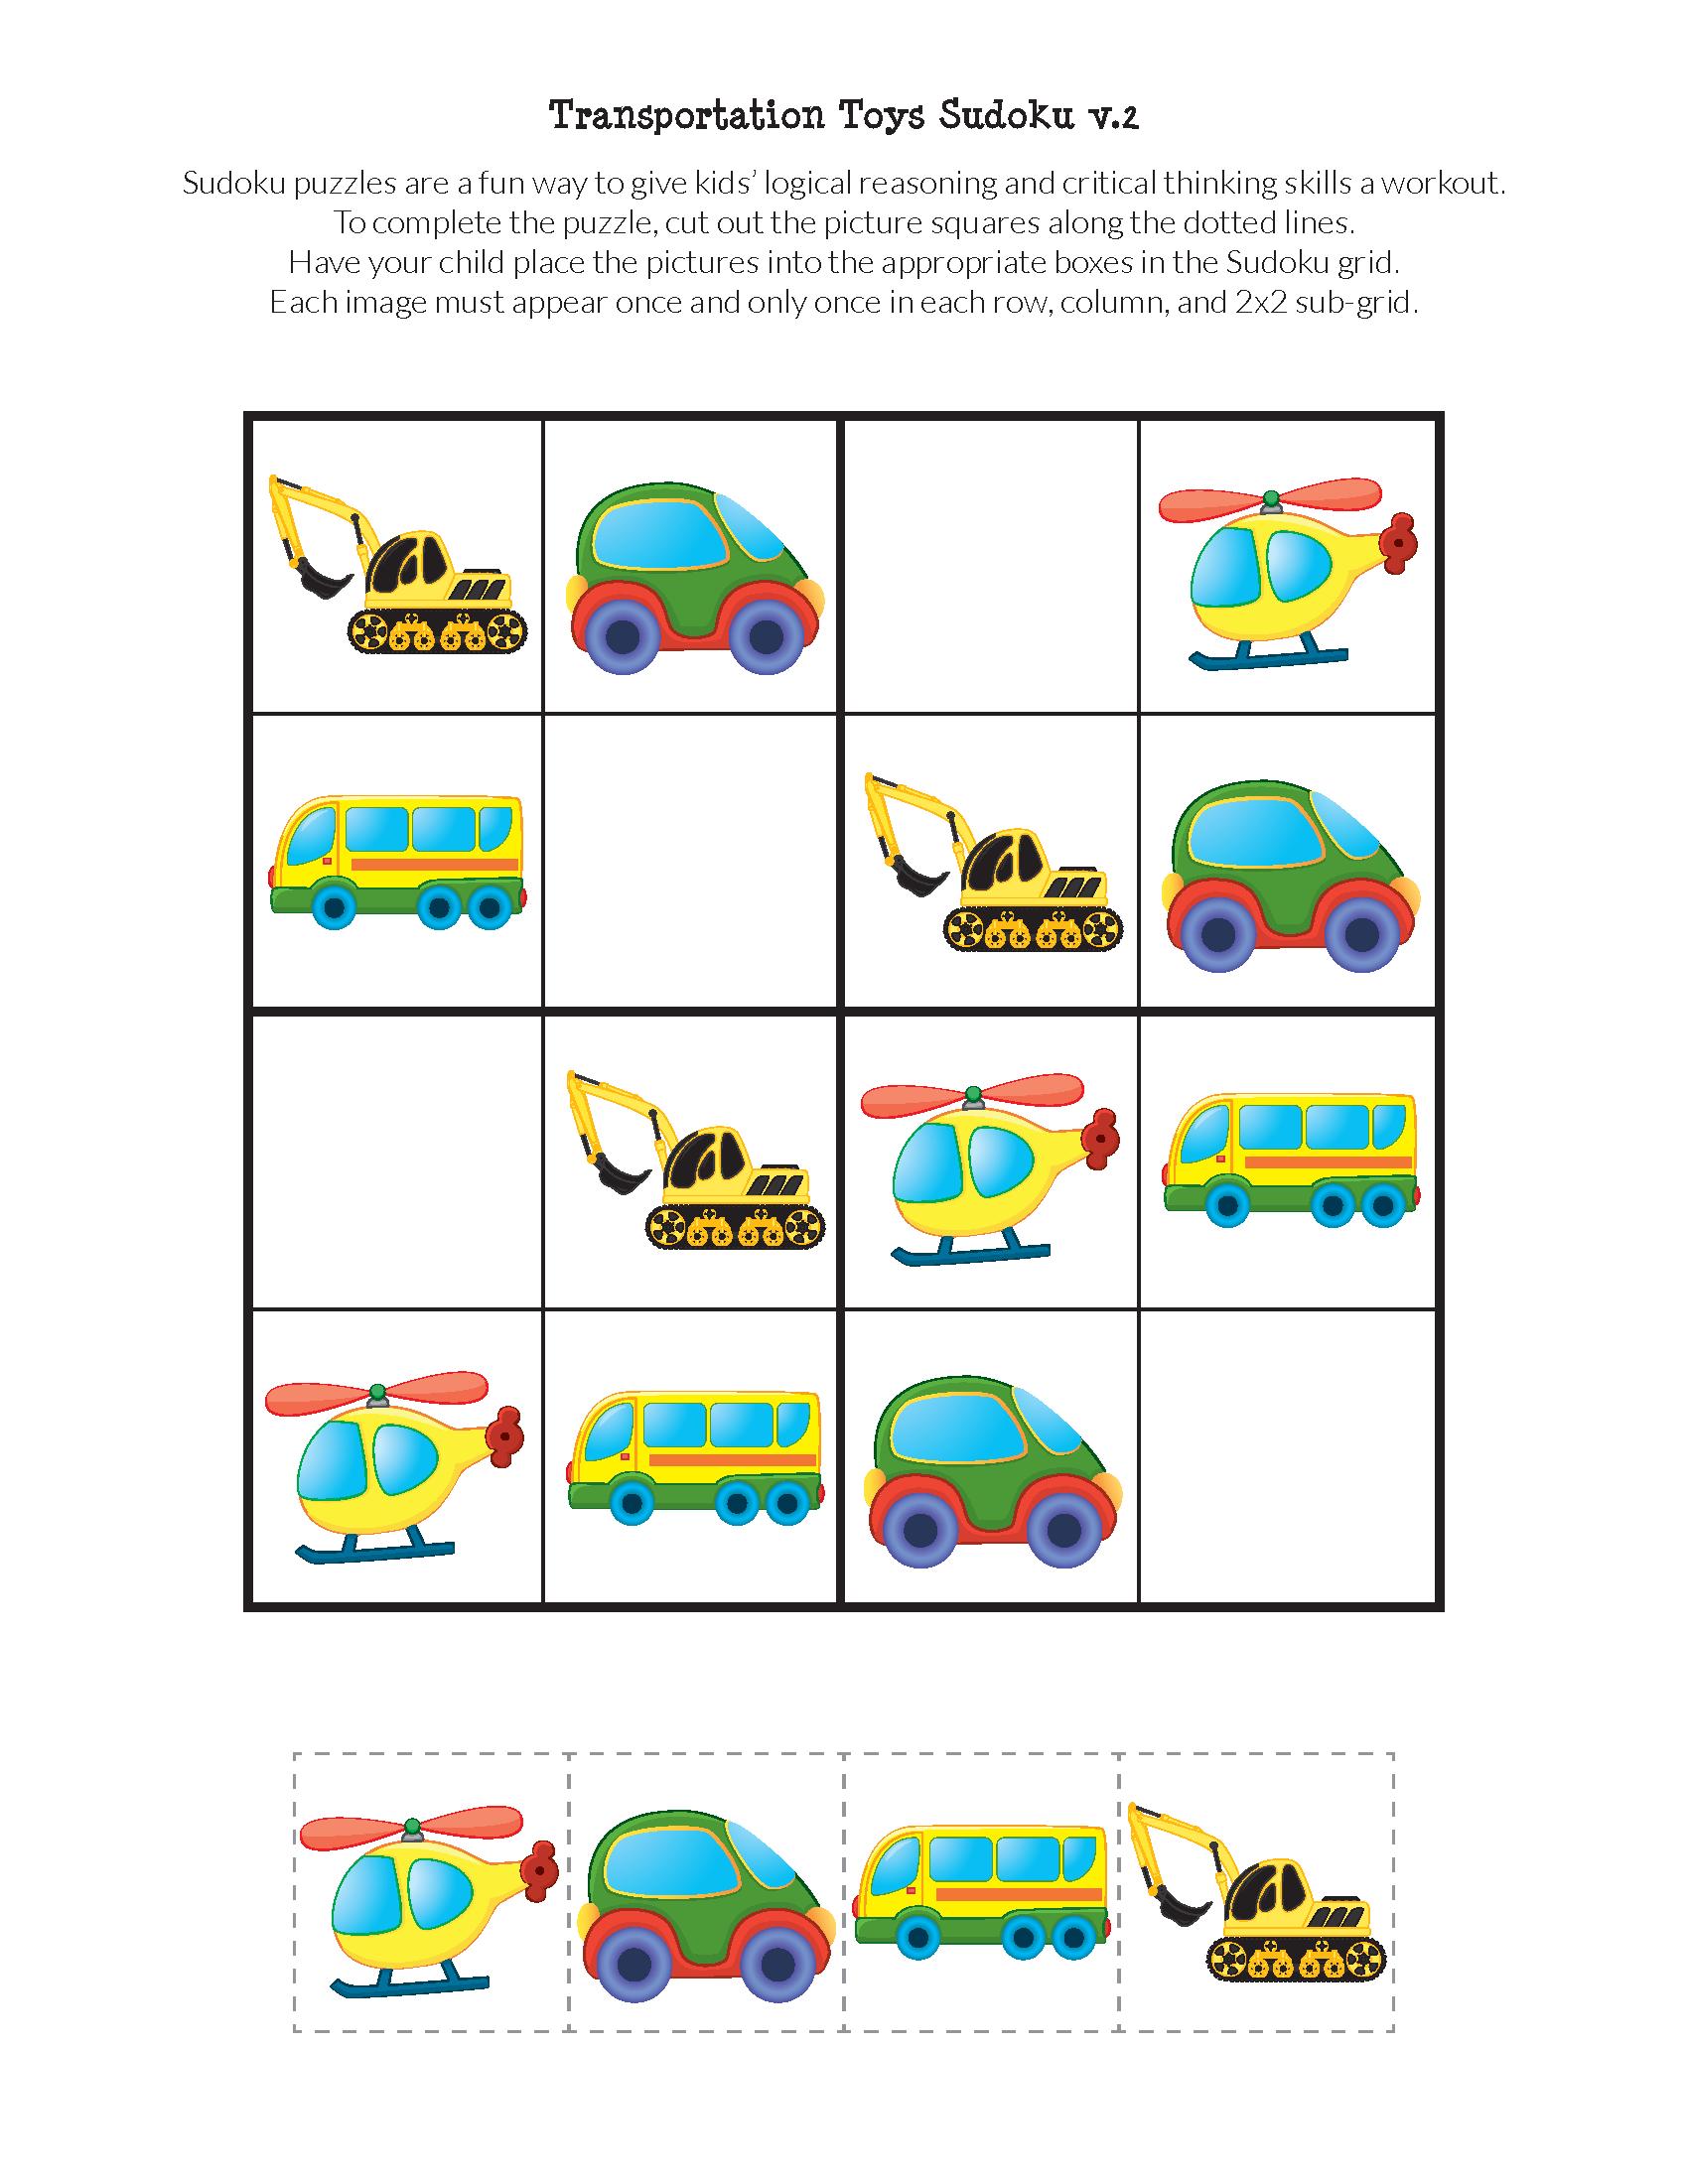 Transportation Toys Sudoku Puzzles